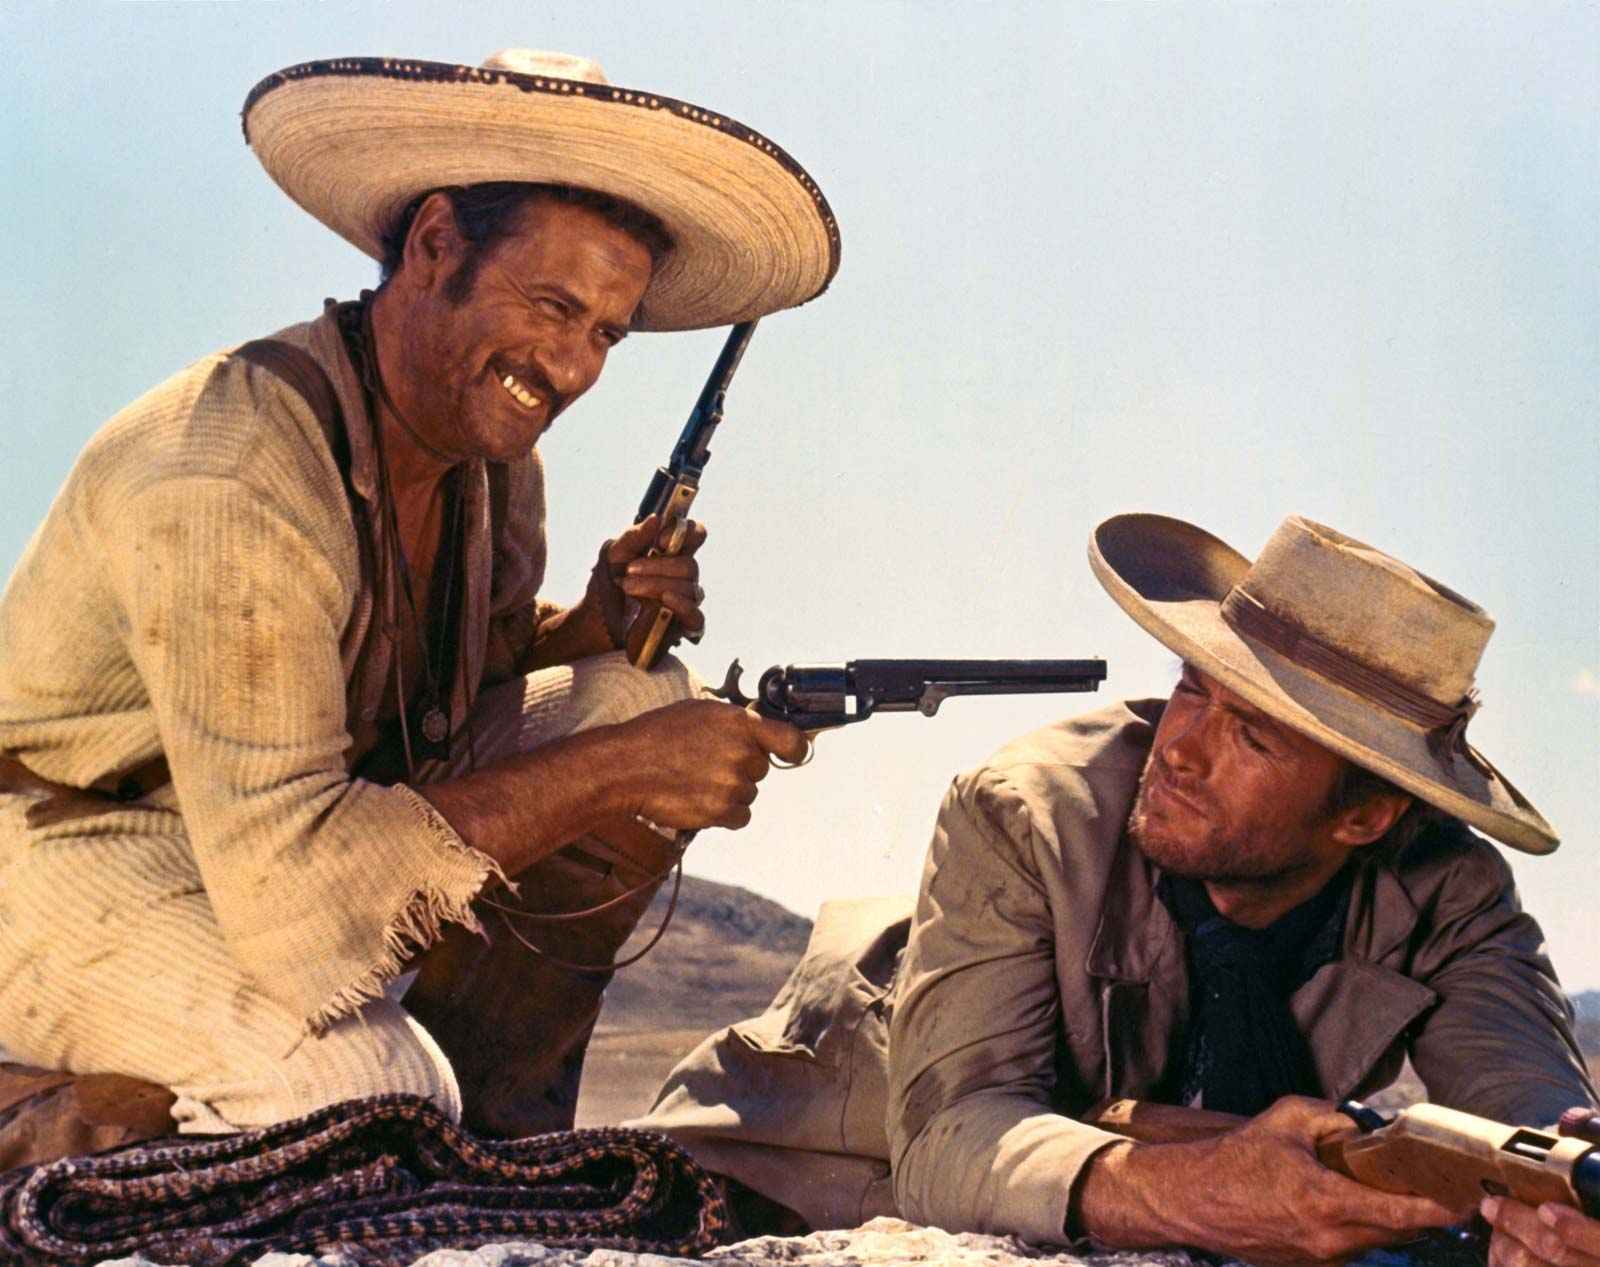 Mannen utan namn (Clint Eastwood) och hans kumpan/ärkefiende, Tuco (Eli Wallach) i Den gode, den onde, den fule. Foto: United Artists.